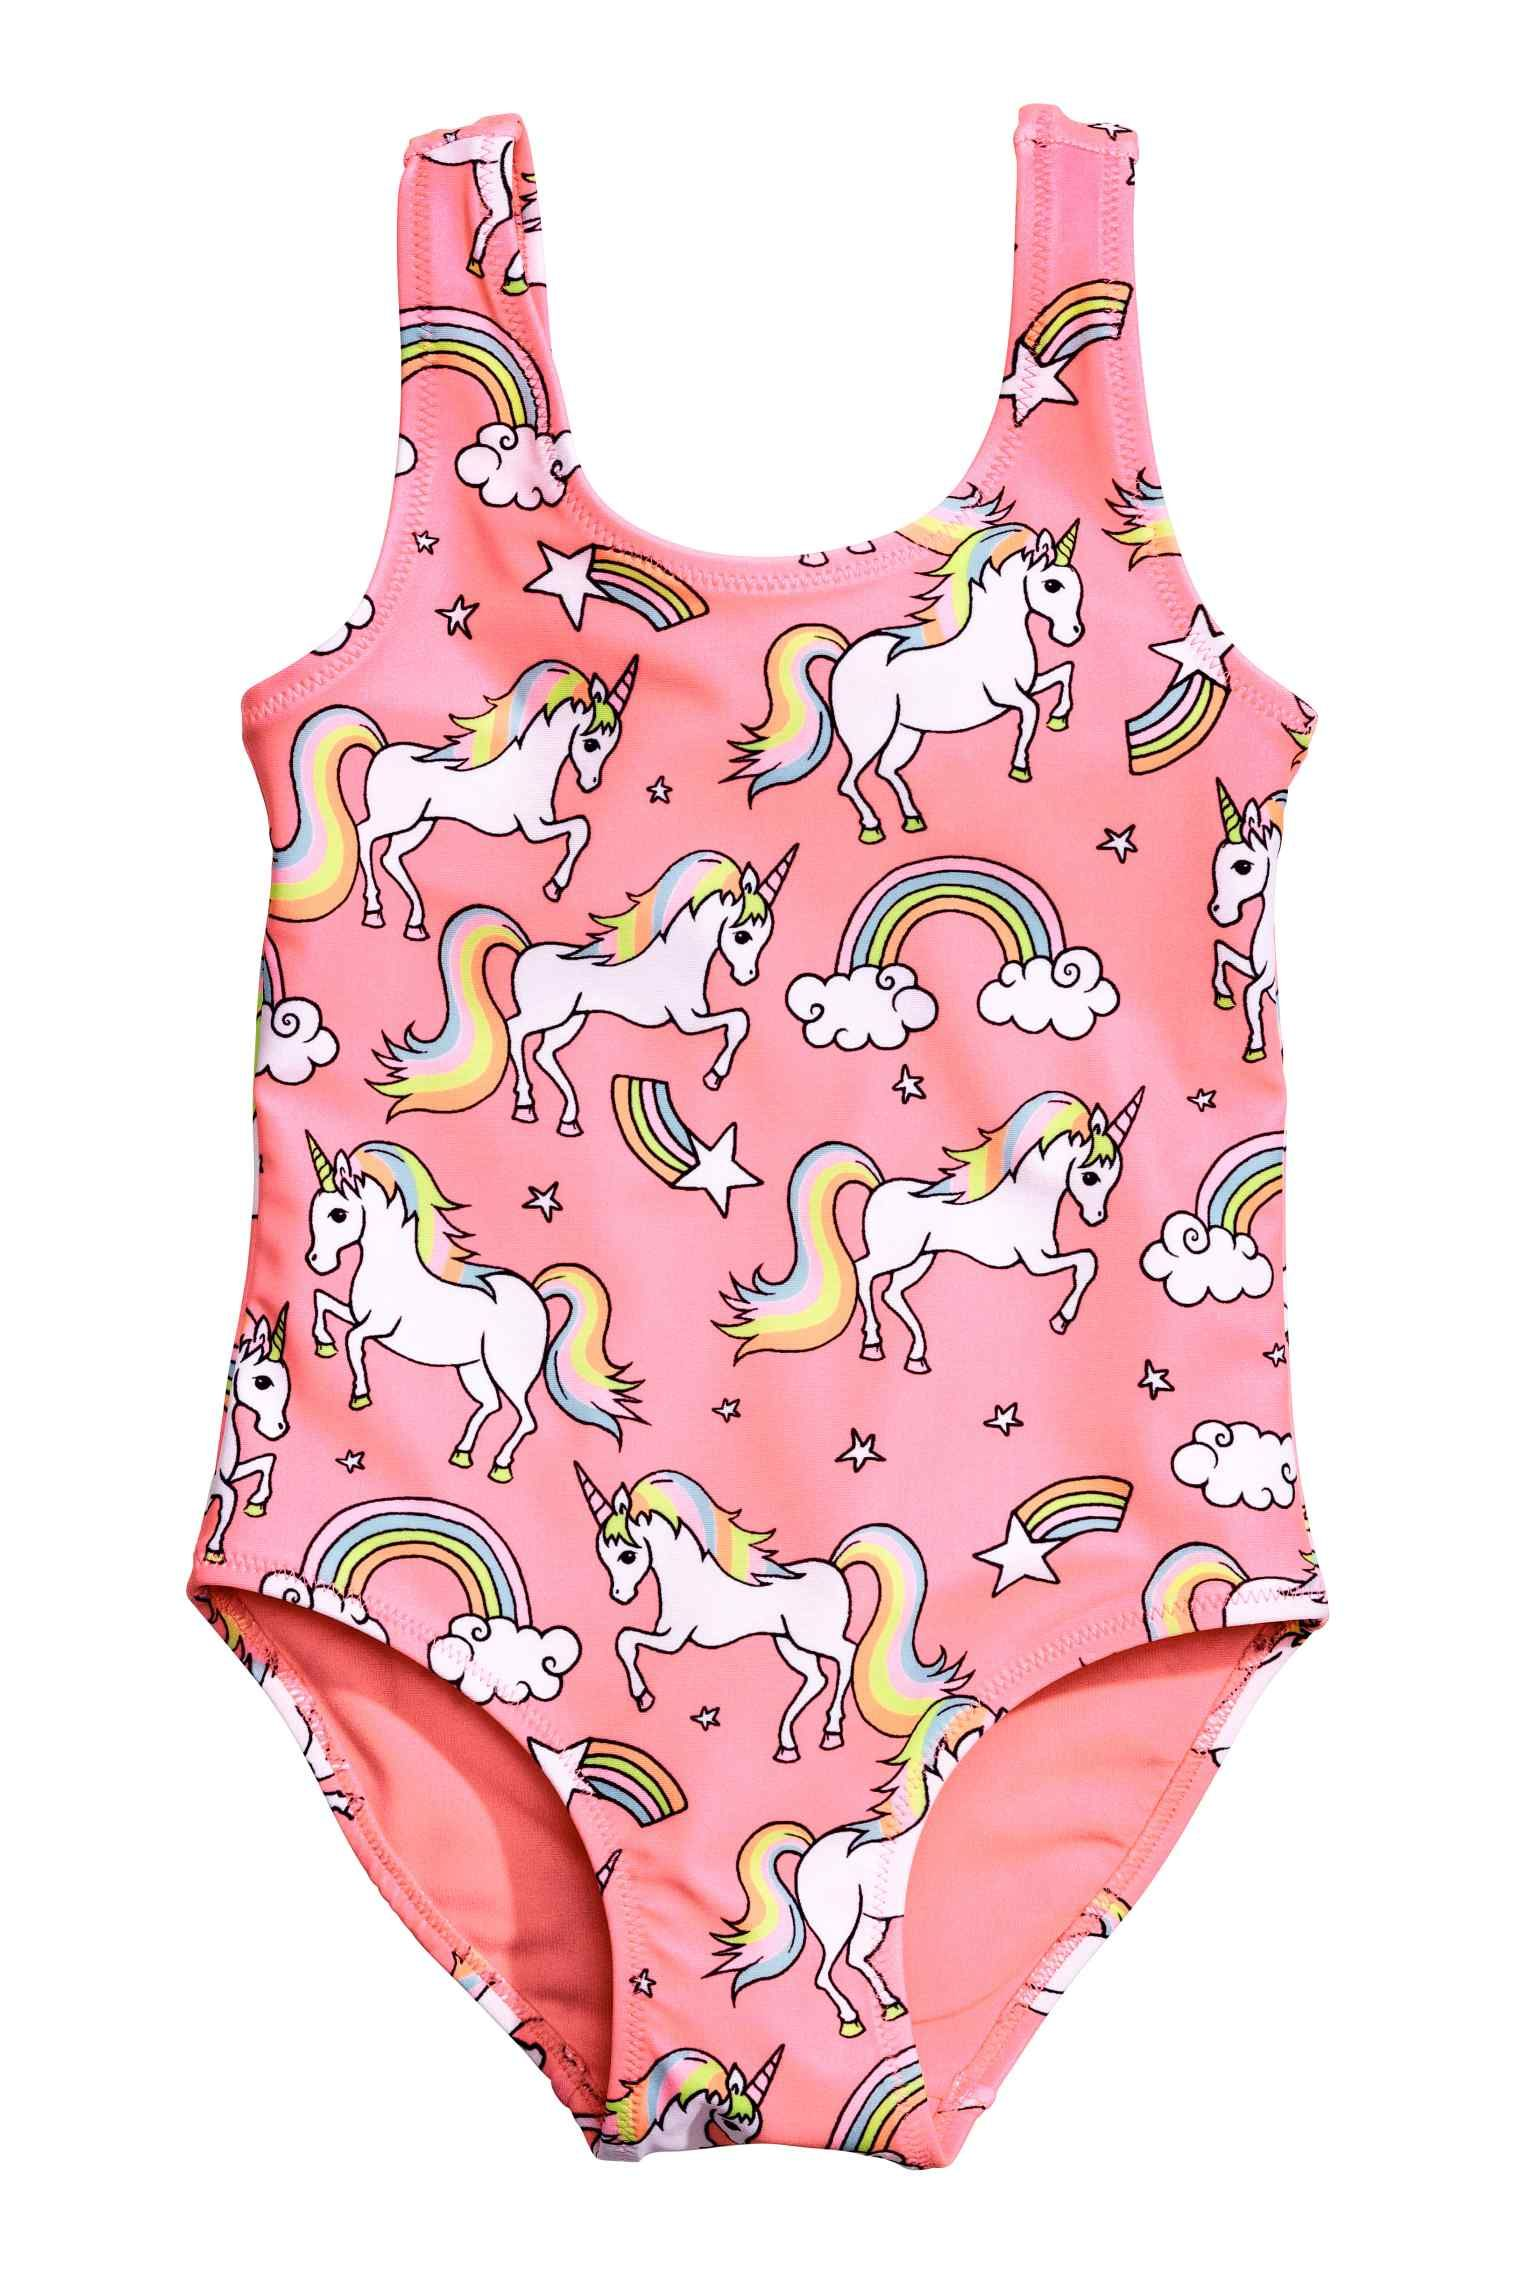 Maillot de bain imprimé | Unicornios, Unicornio y El unicornio